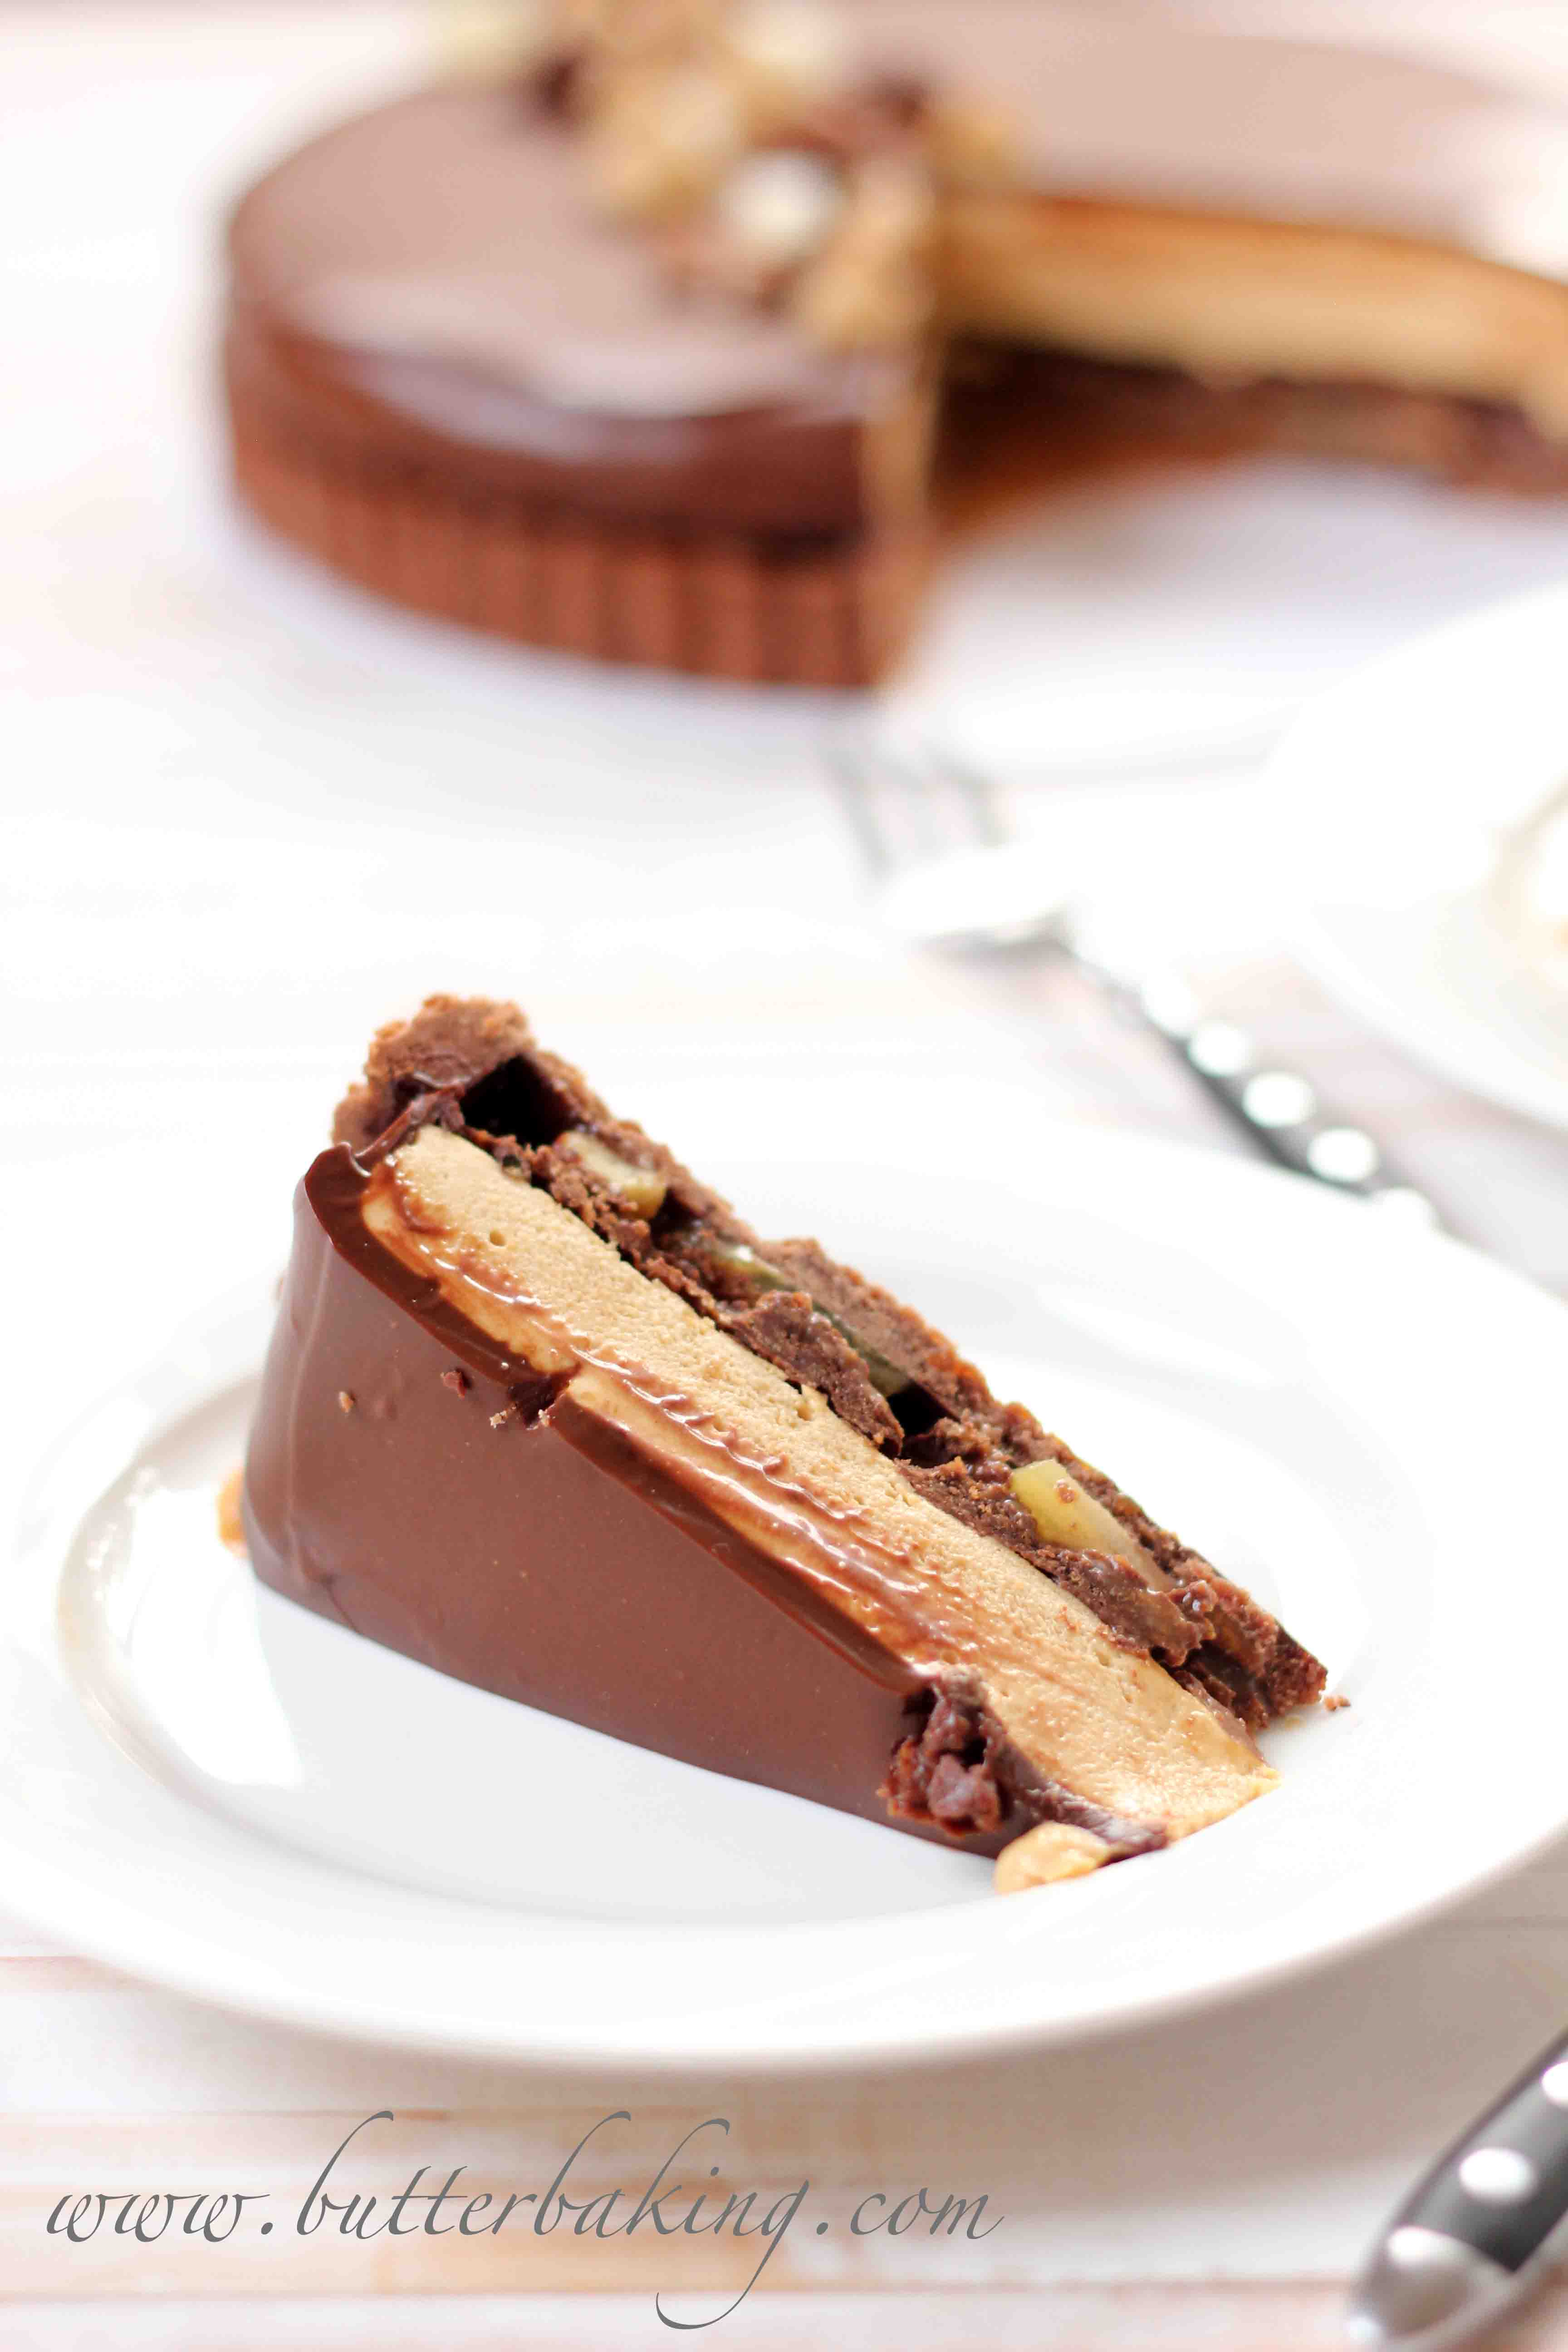 ... honey date and pecan tart recipe dishmaps honey date and pecan tart